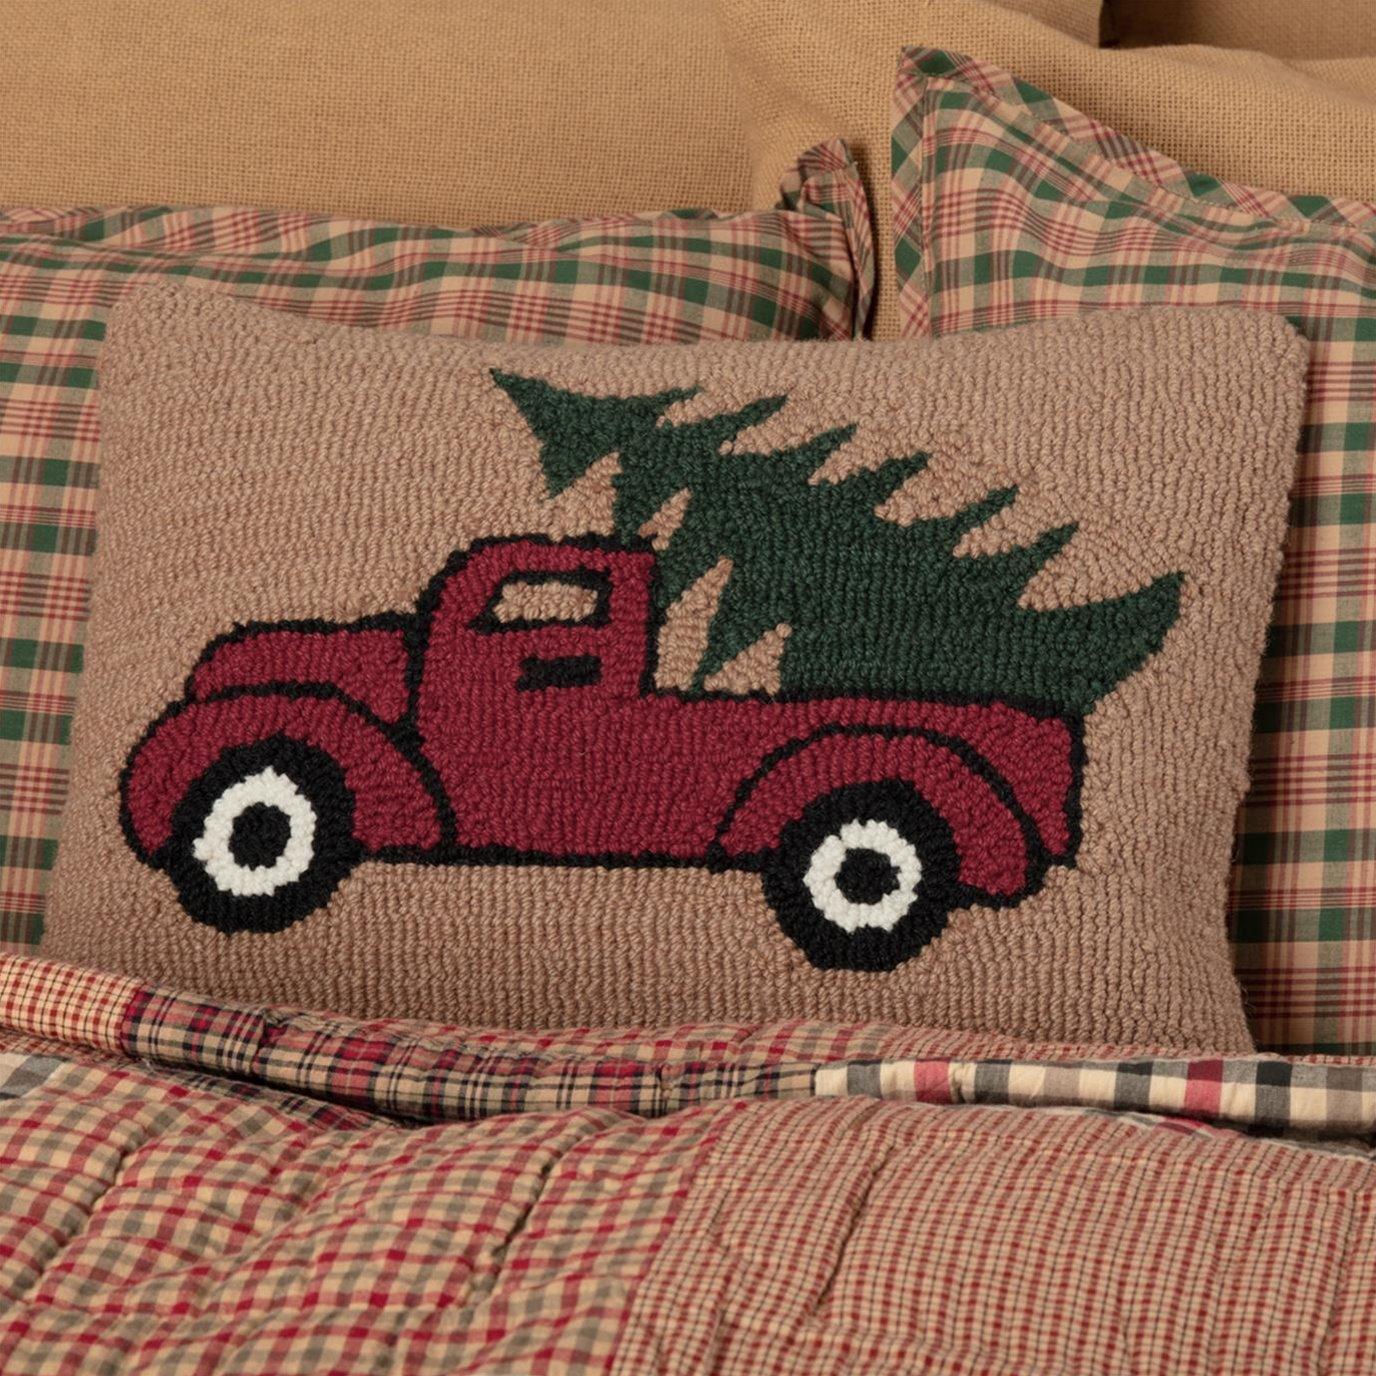 Hooked Truck Pillow 14x18